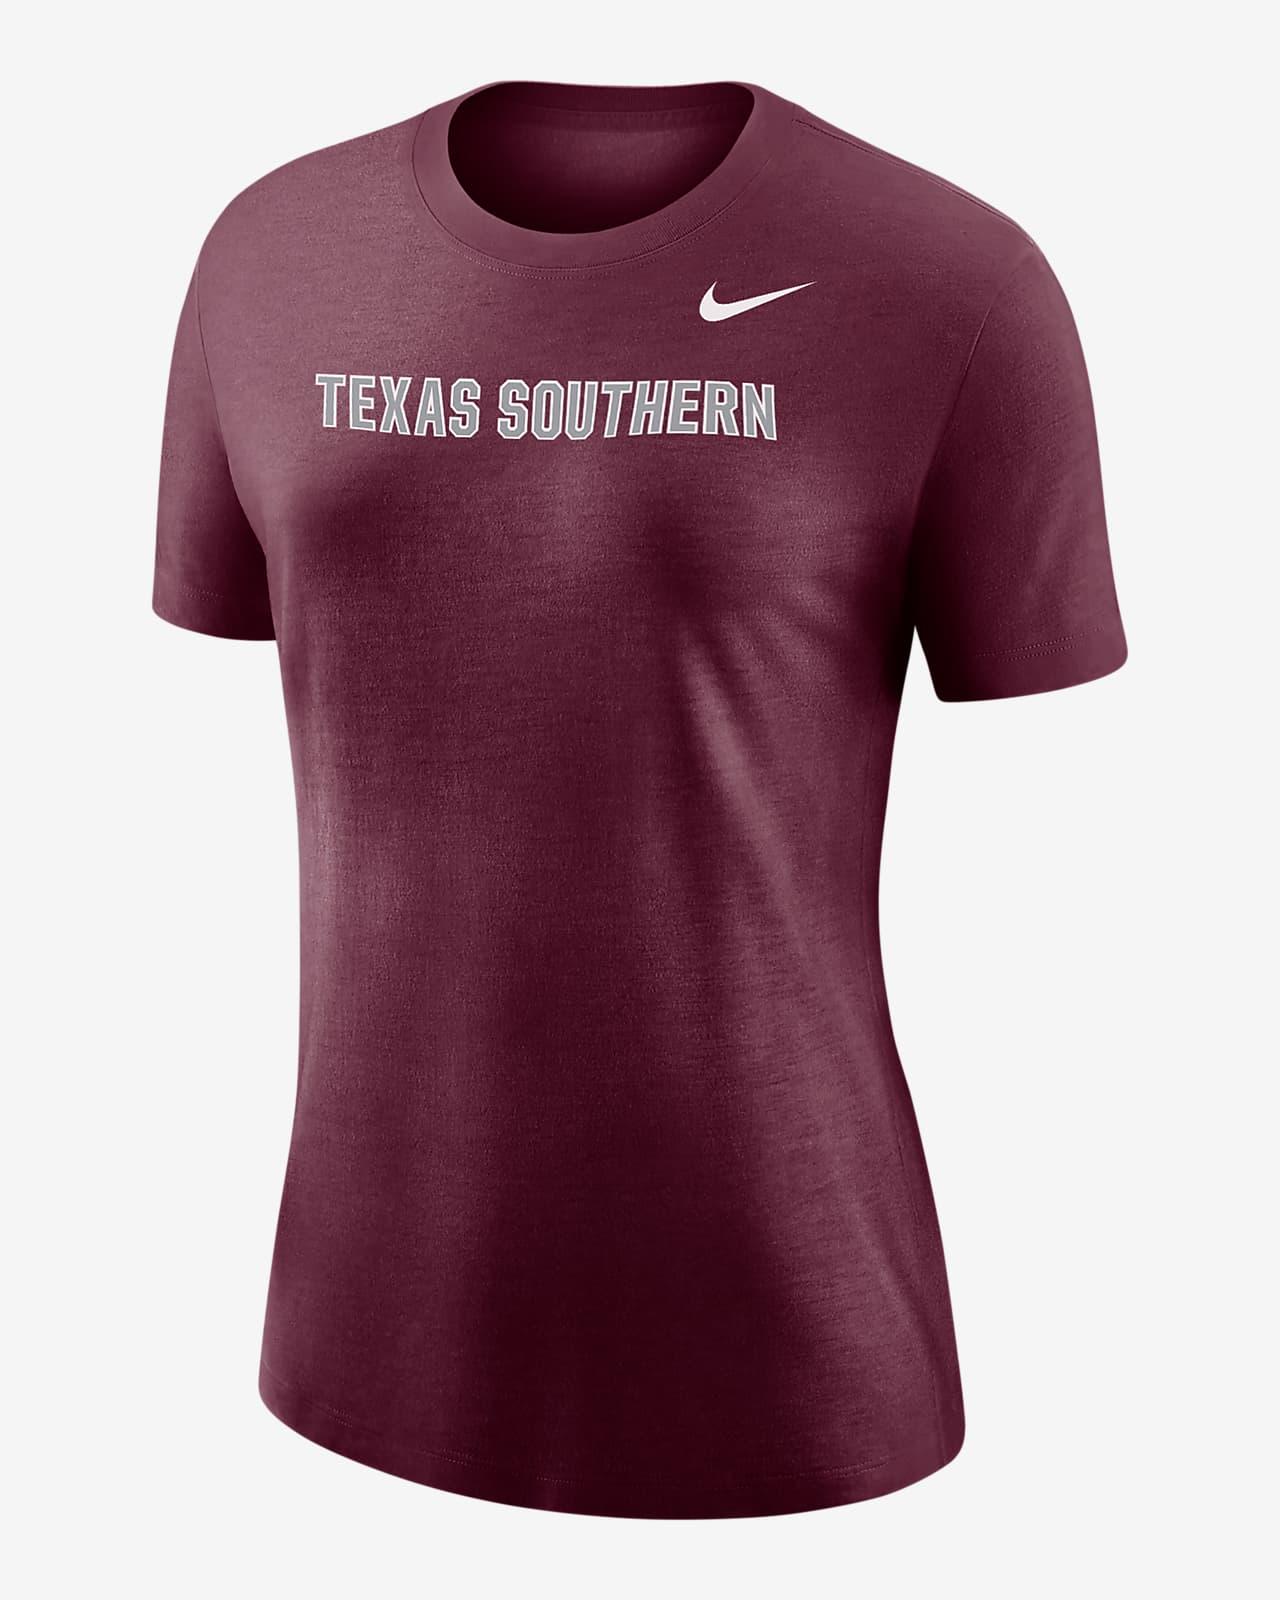 Nike College (Texas Southern) Women's T-Shirt